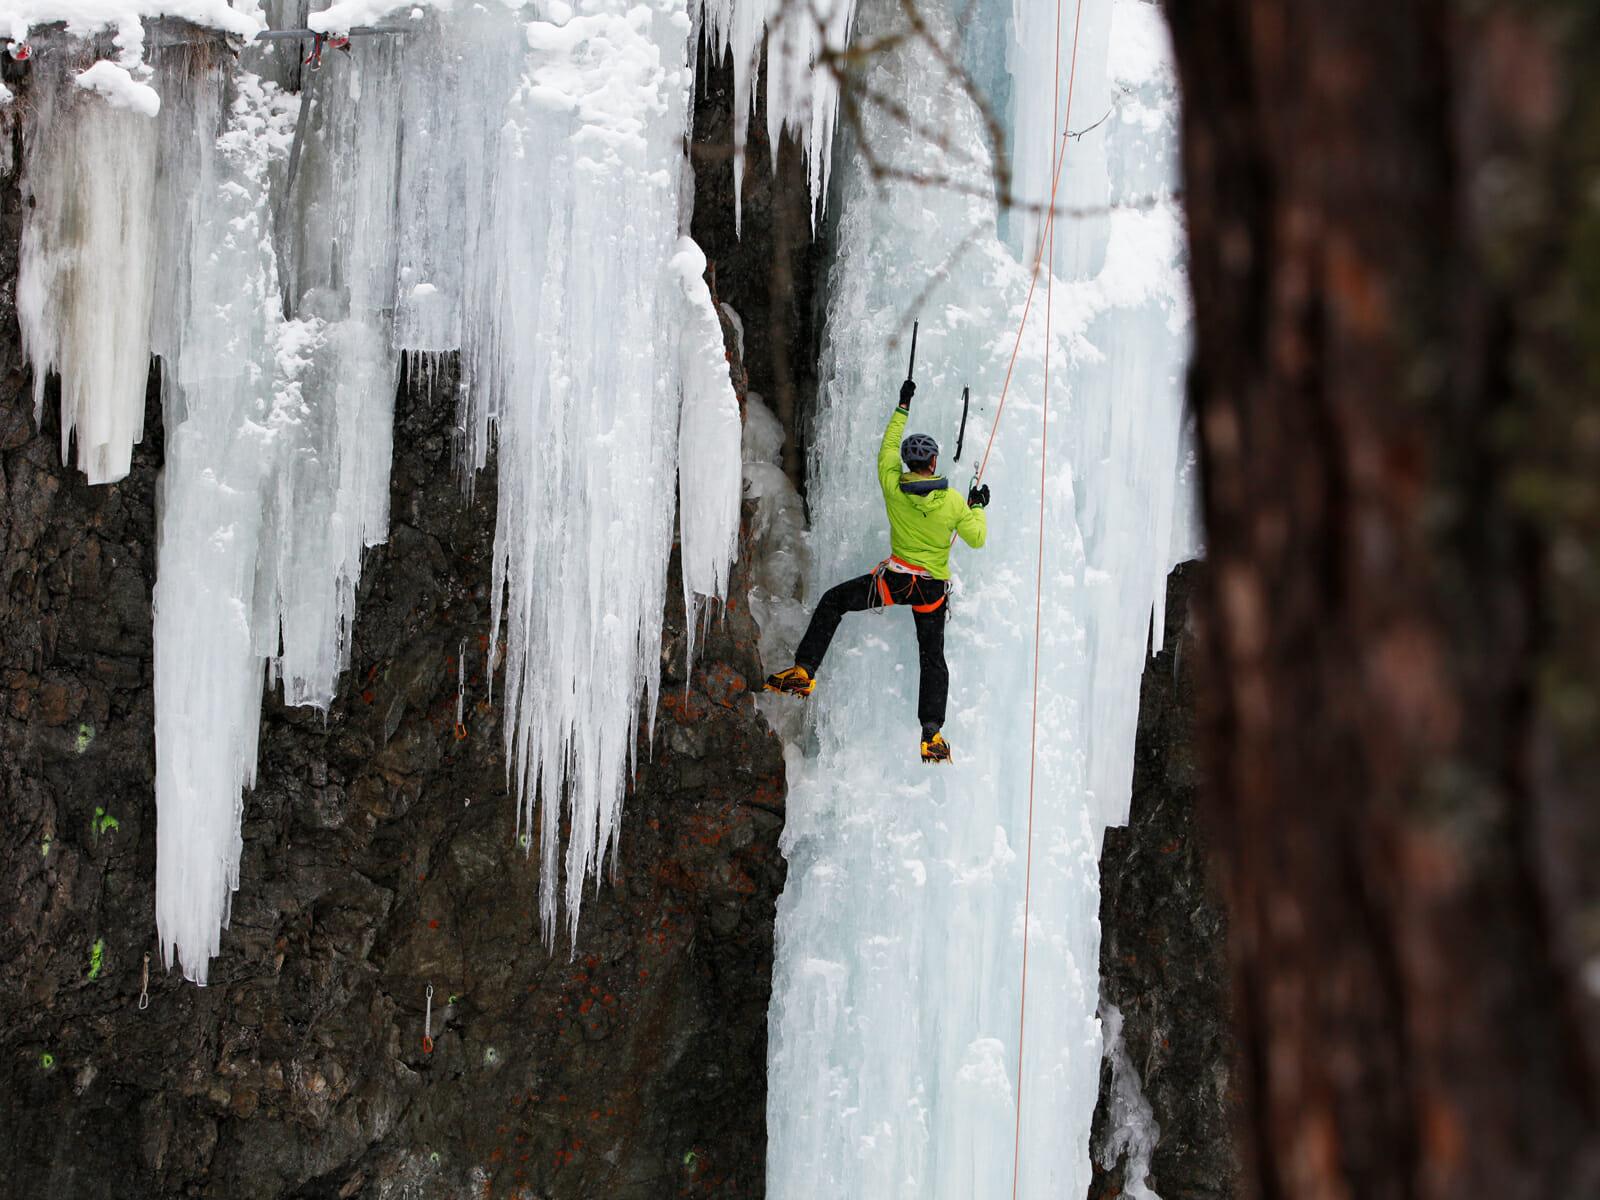 Klettergurt Eisklettern : Klettergurt eisklettern faszination